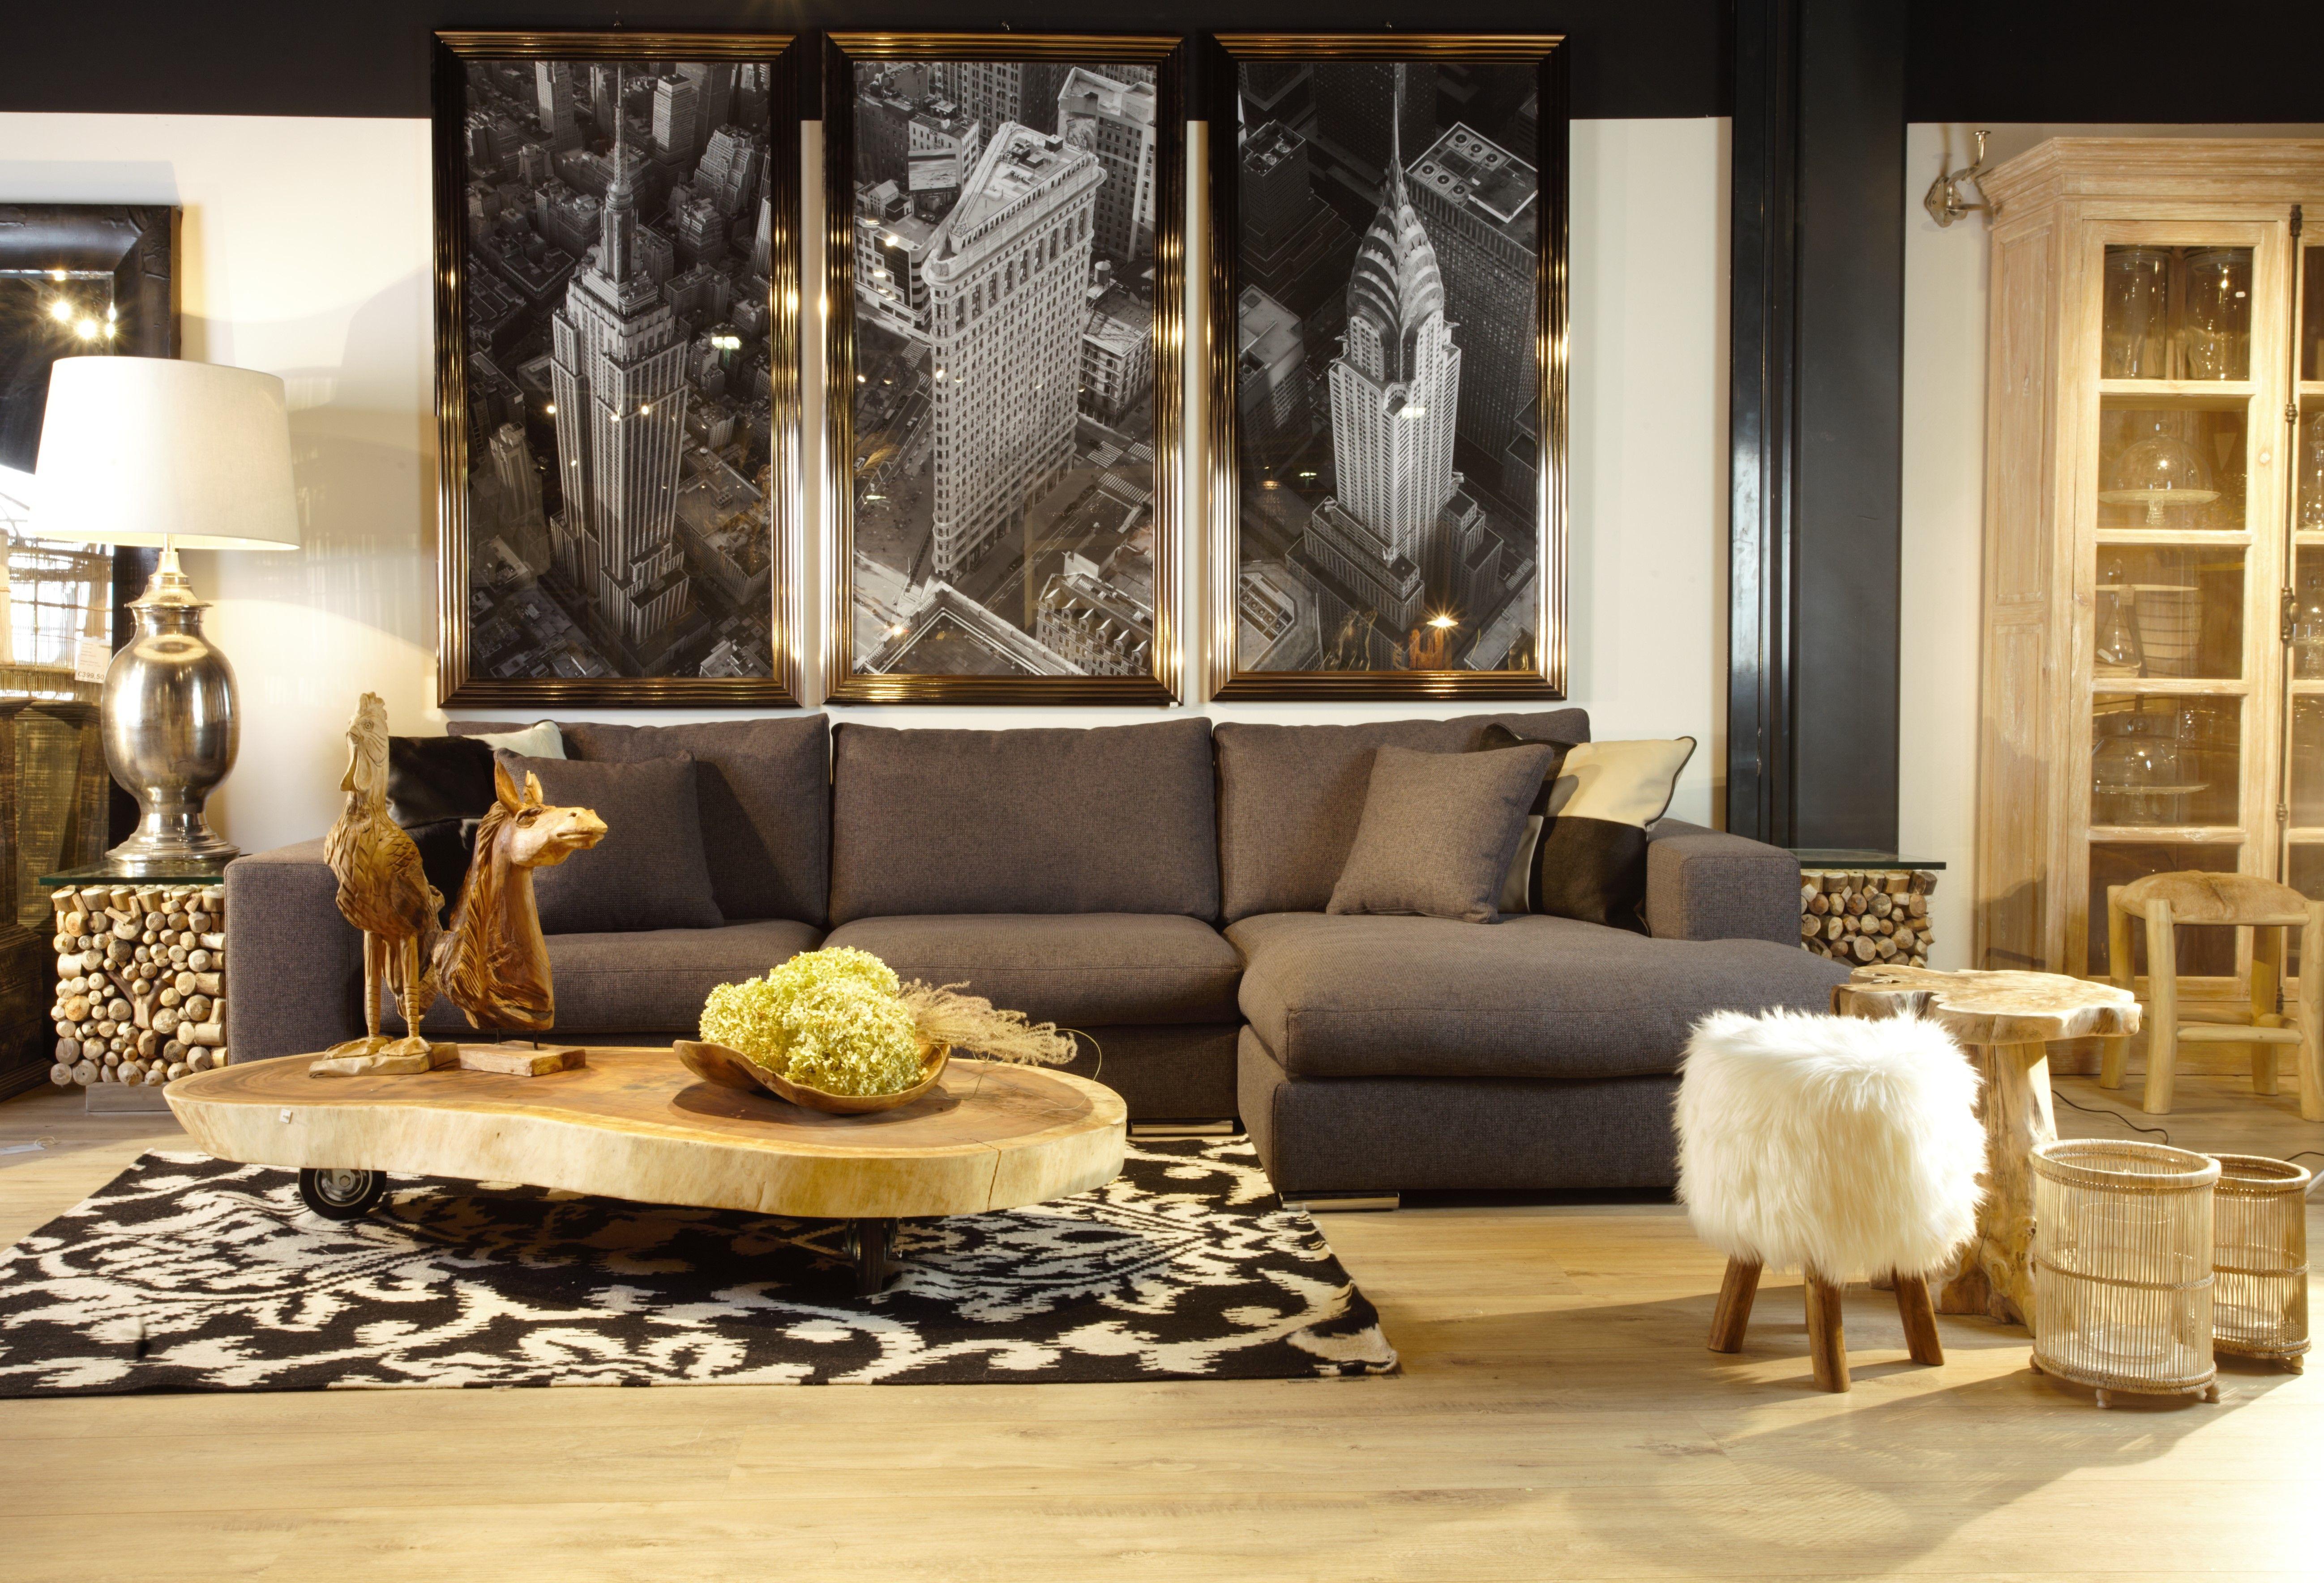 Prachtige woonkamer | Rofra Home | Woonkamer inspiratie | Rofra Home ...